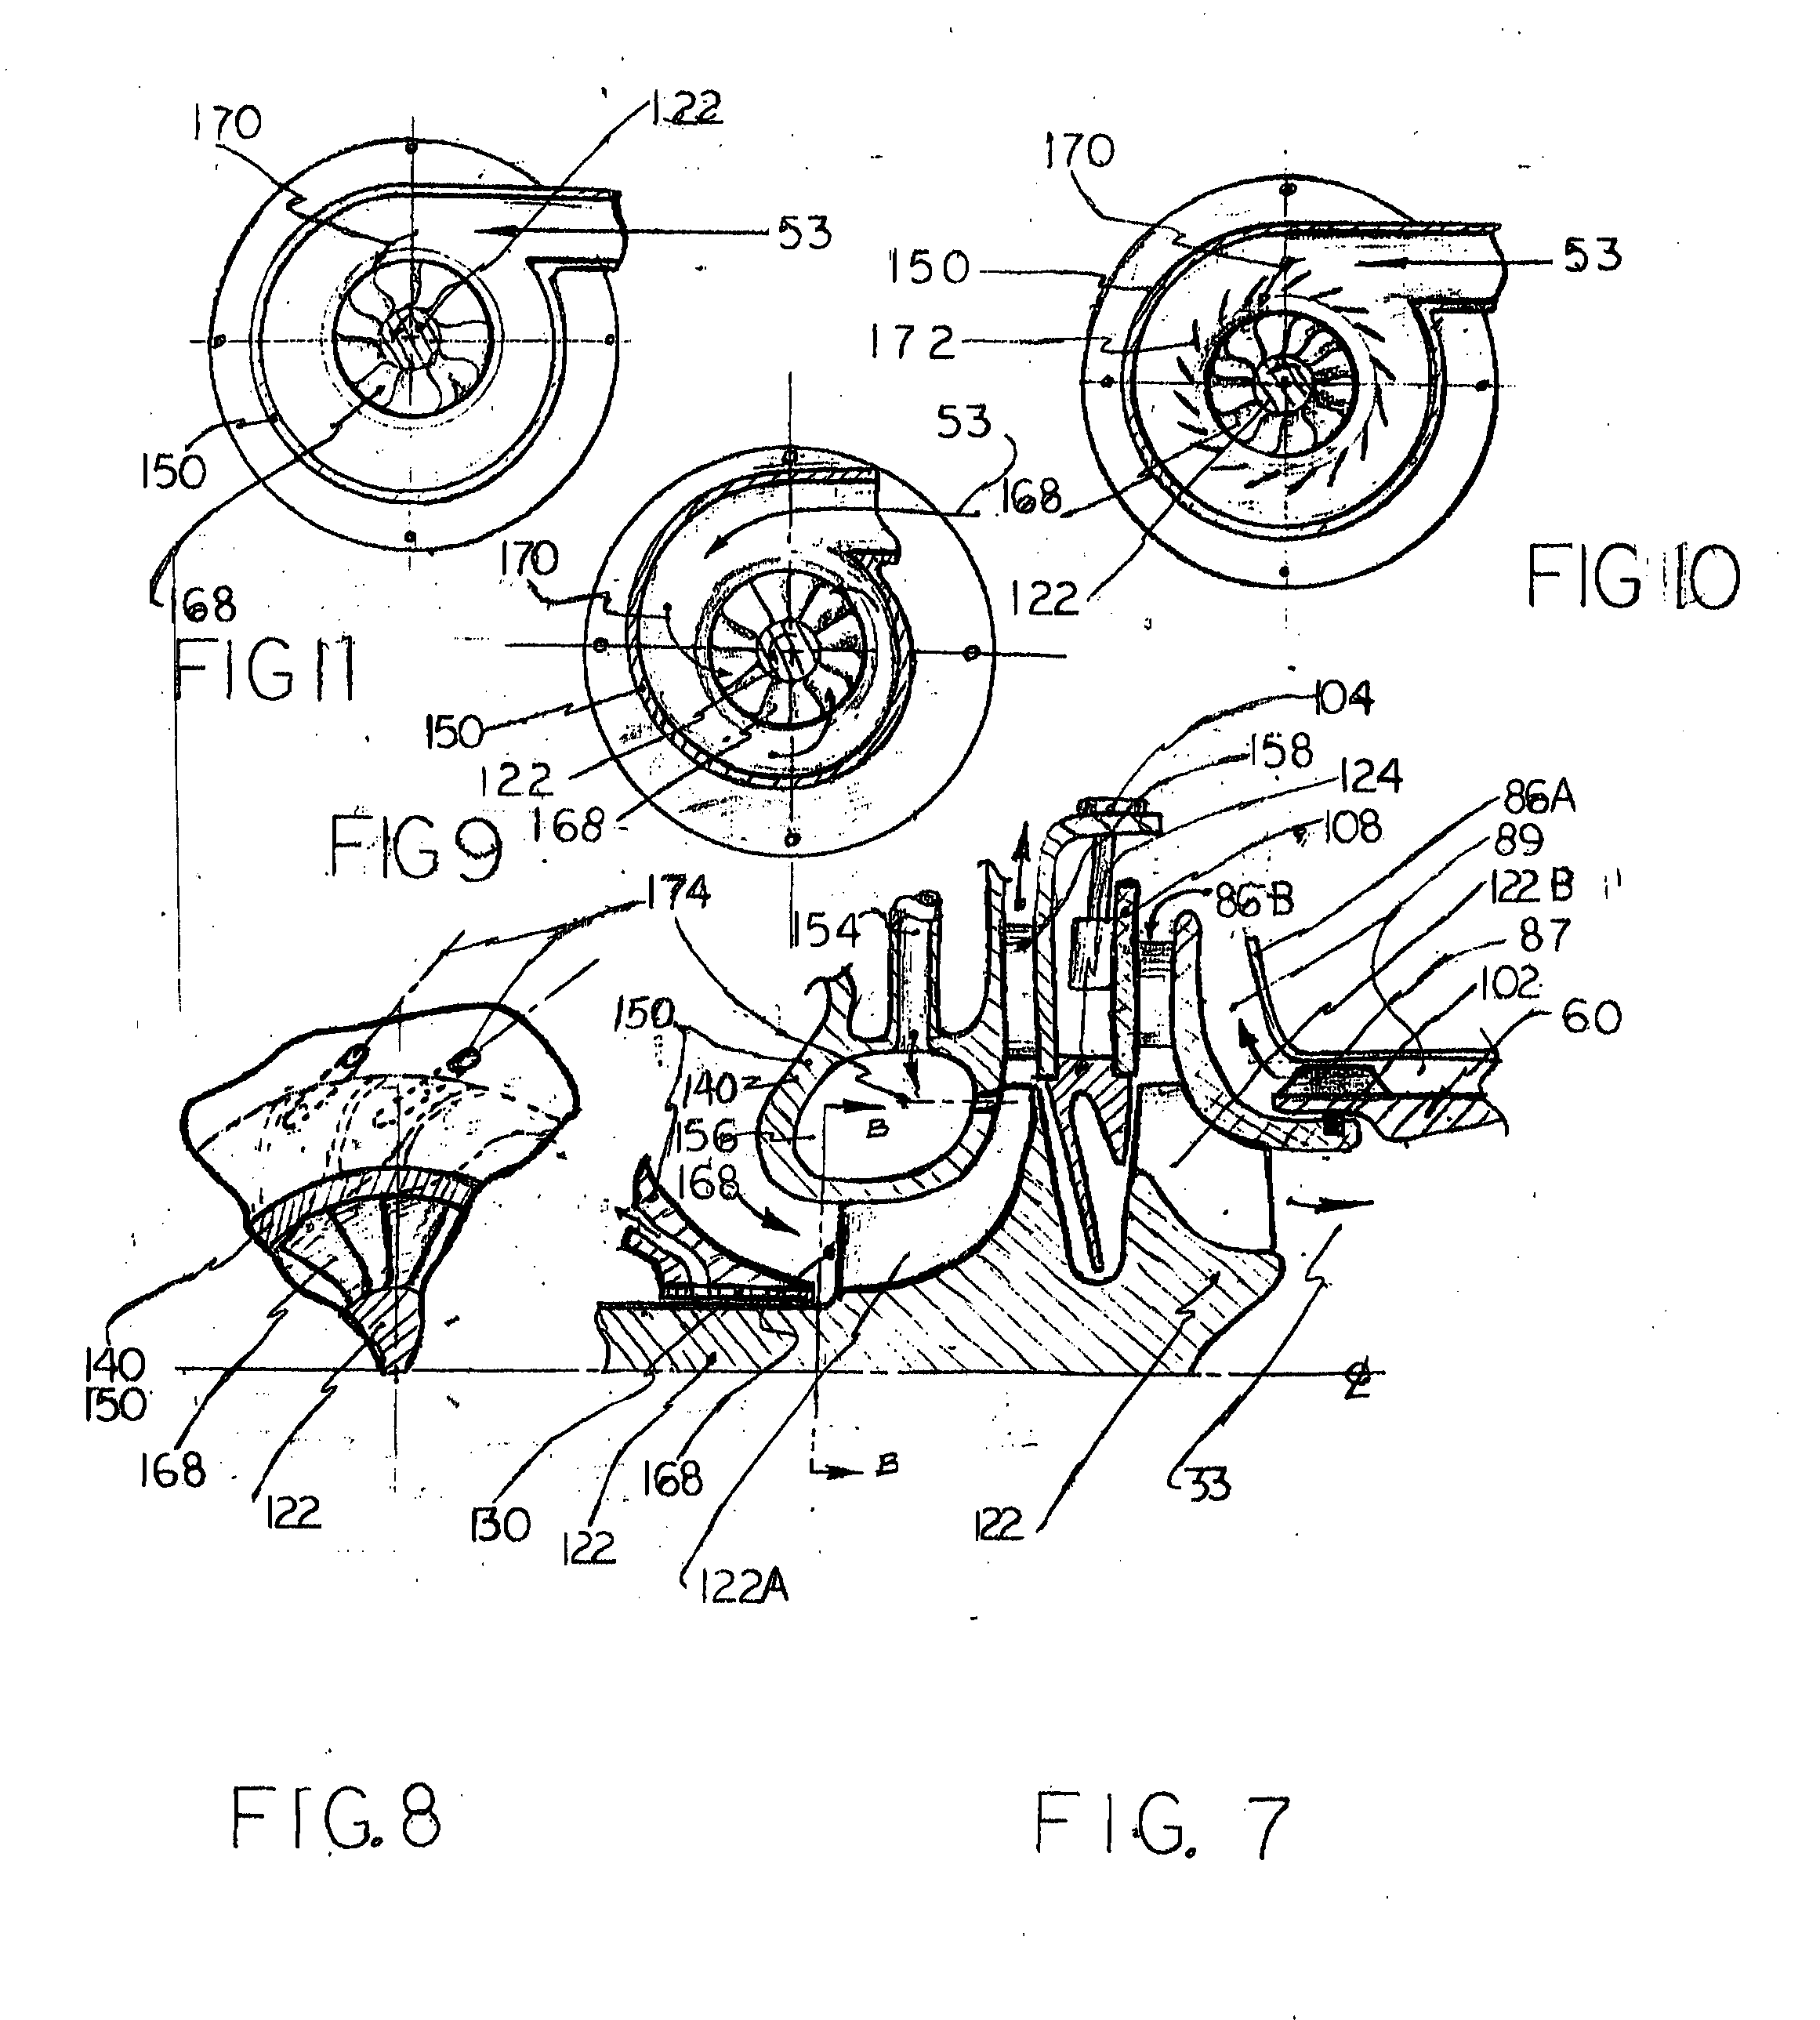 Honda Aero 80 Wiring Diagram Auto Electrical Shadow 2002 Engine Parts